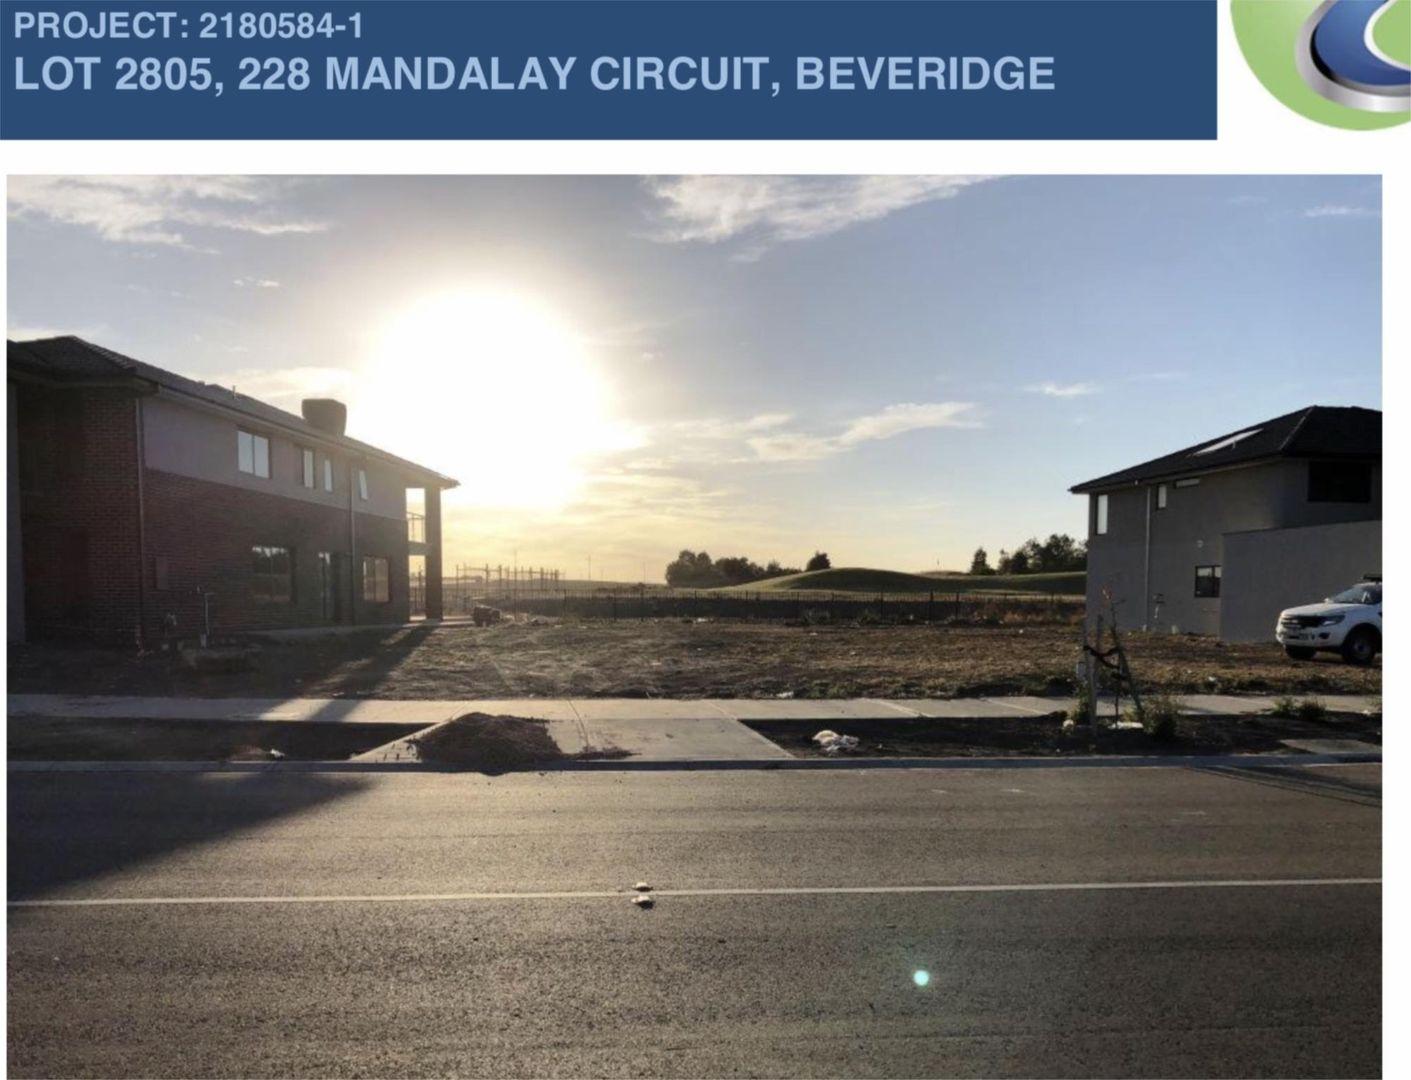 Lot 2805 (228) Mandalay Circuit, Beveridge VIC 3753, Image 2